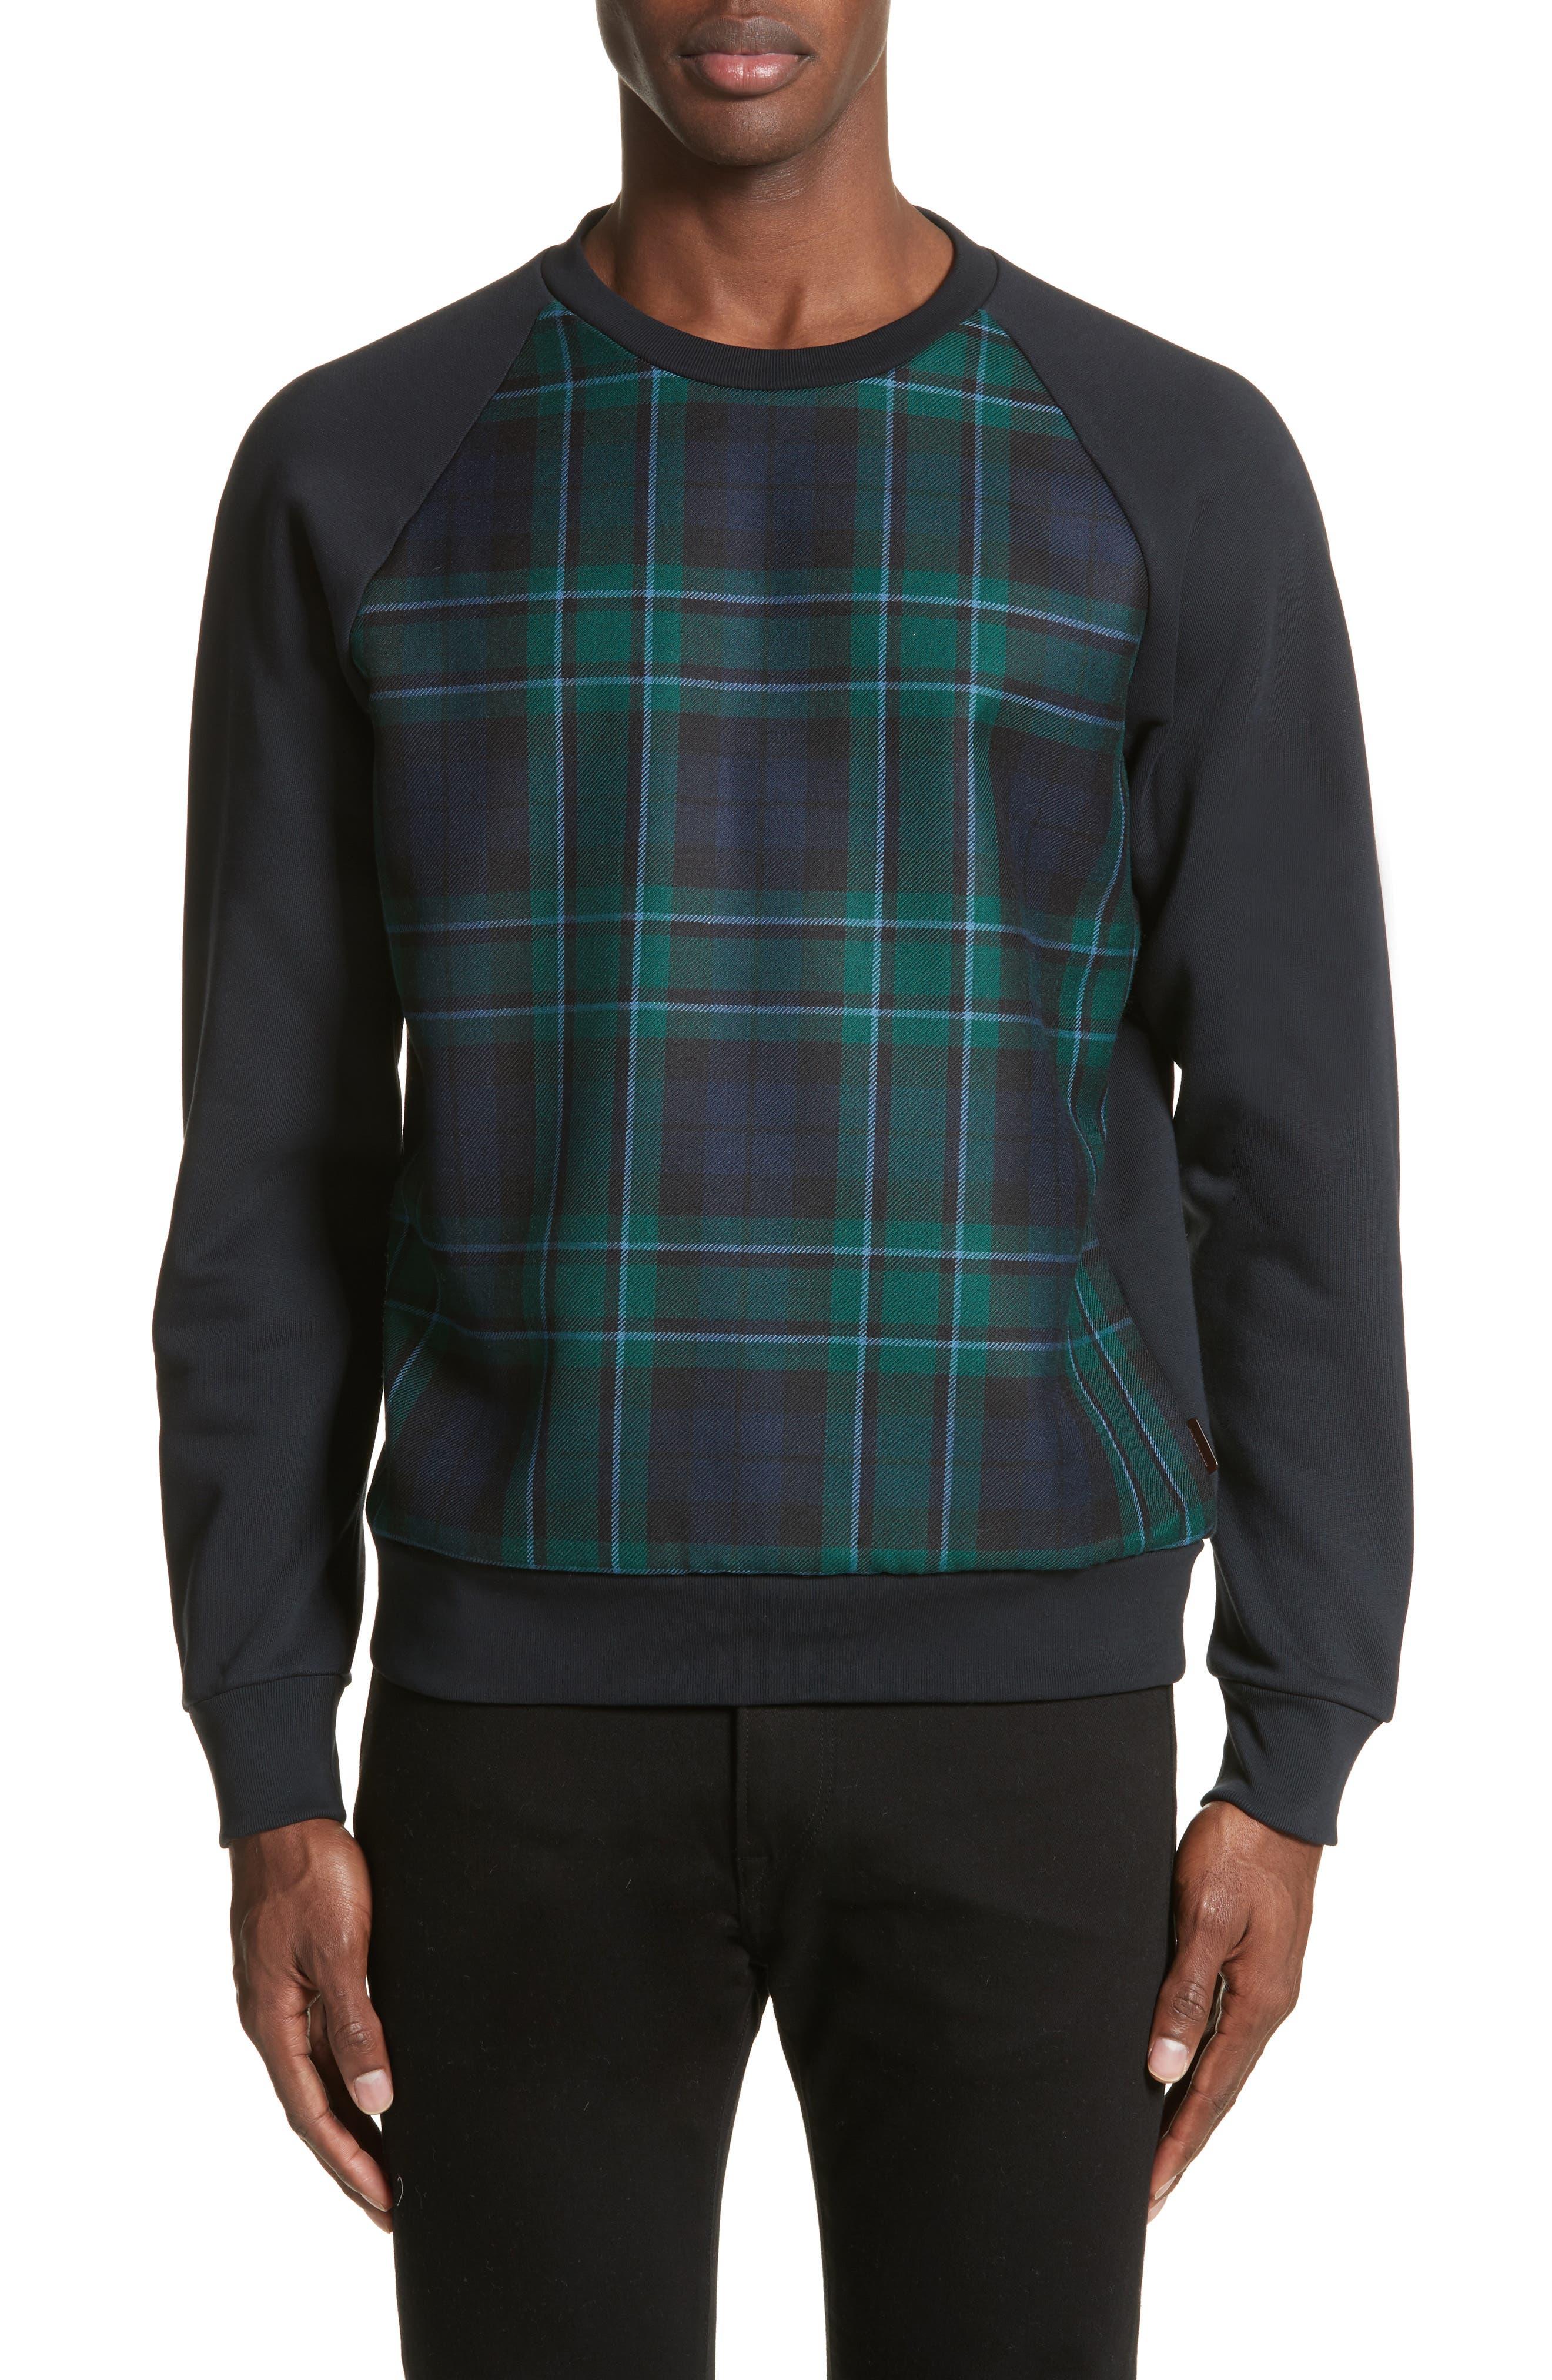 Main Image - Burberry Beachen Tartan Panel Jersey Sweatshirt